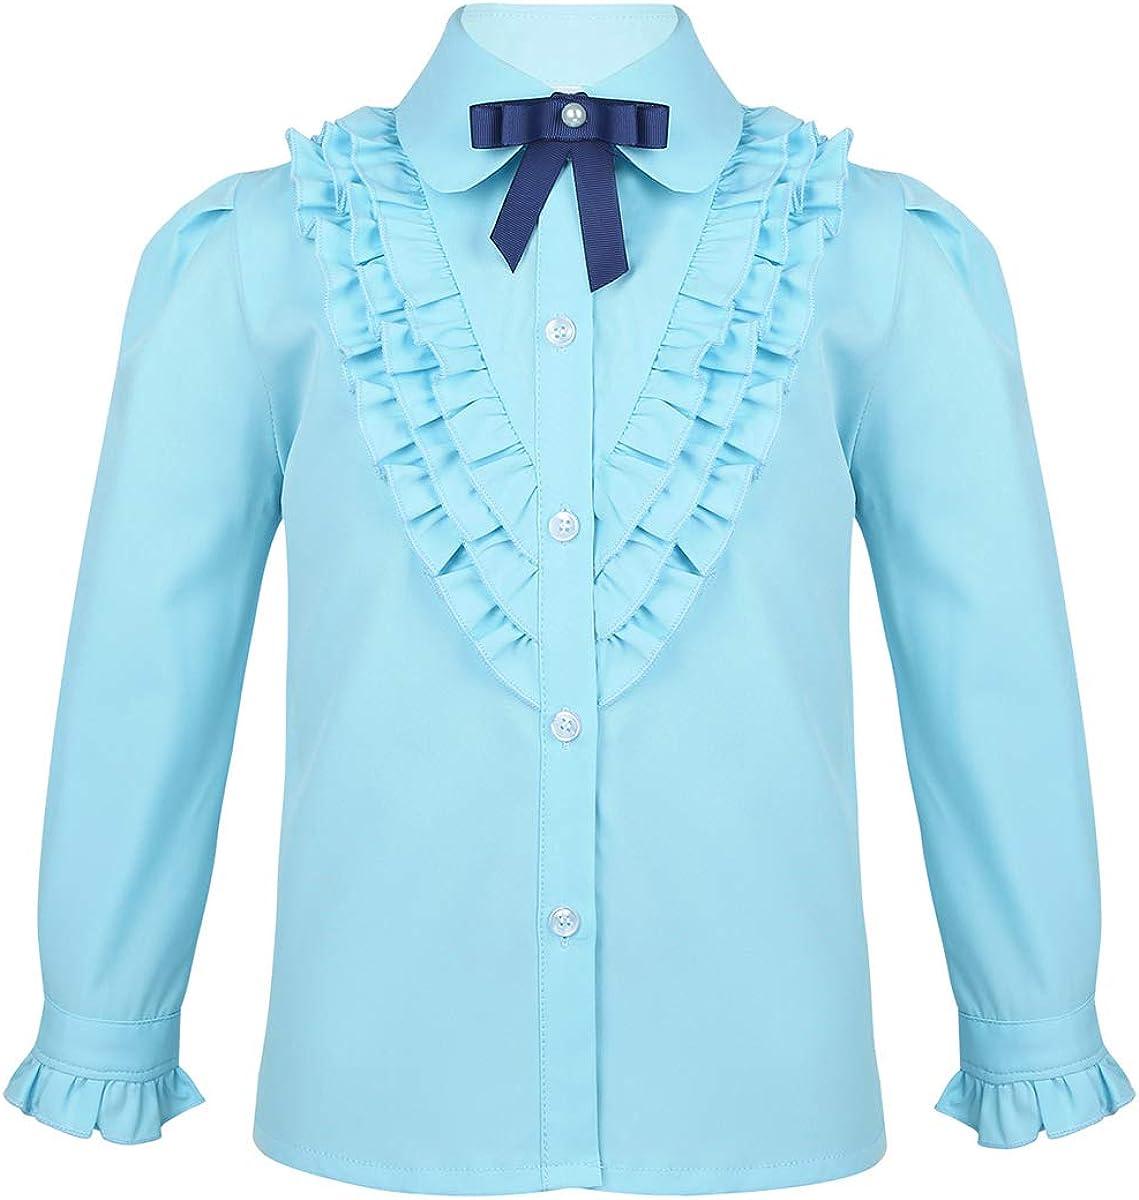 ranrann Kids Girls Princess Bargain Bow Uniforms Ruffled T-Shirt School shipfree